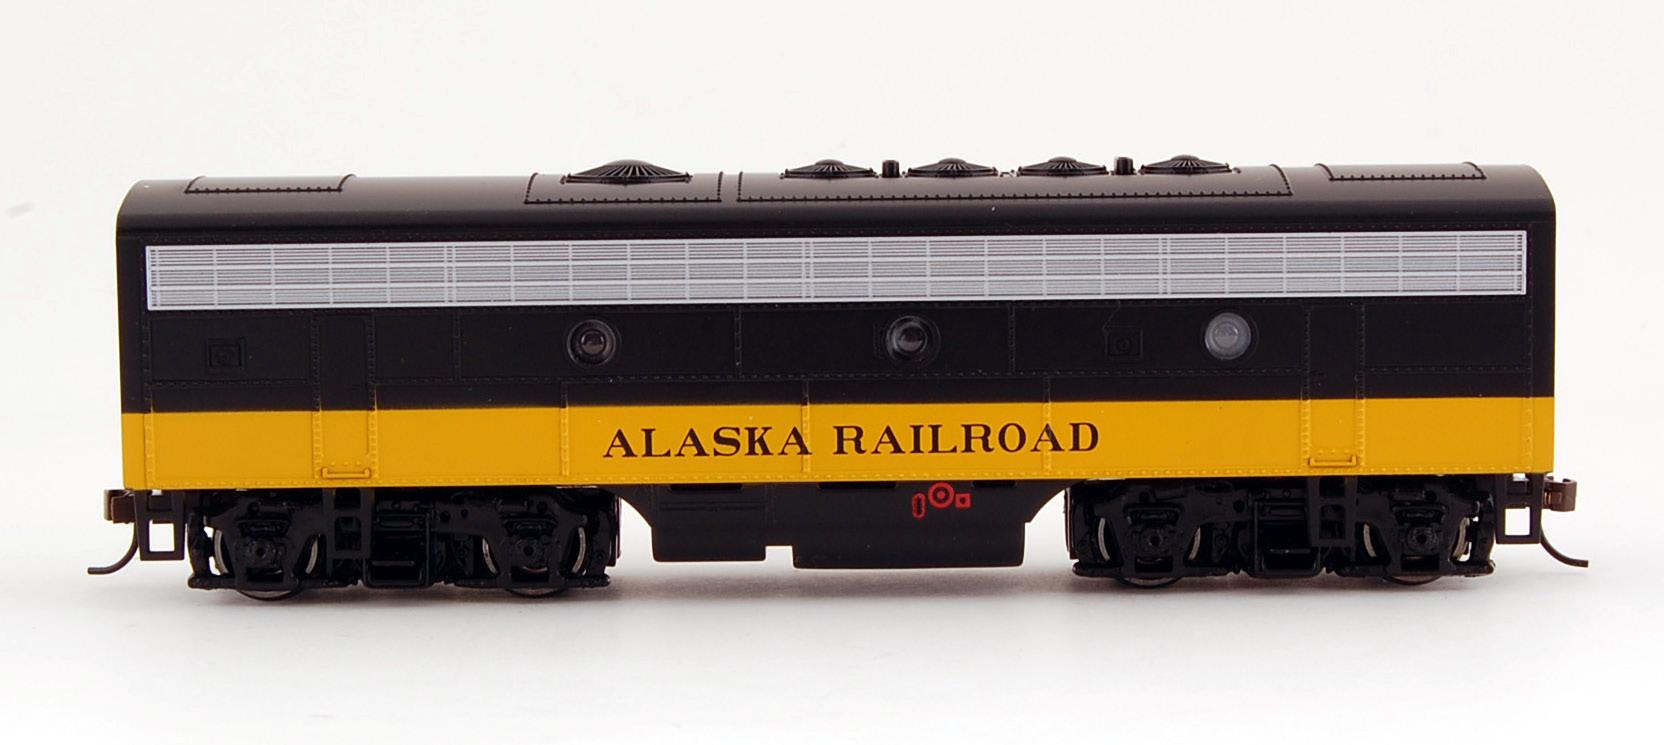 Dcc ho scale train sets